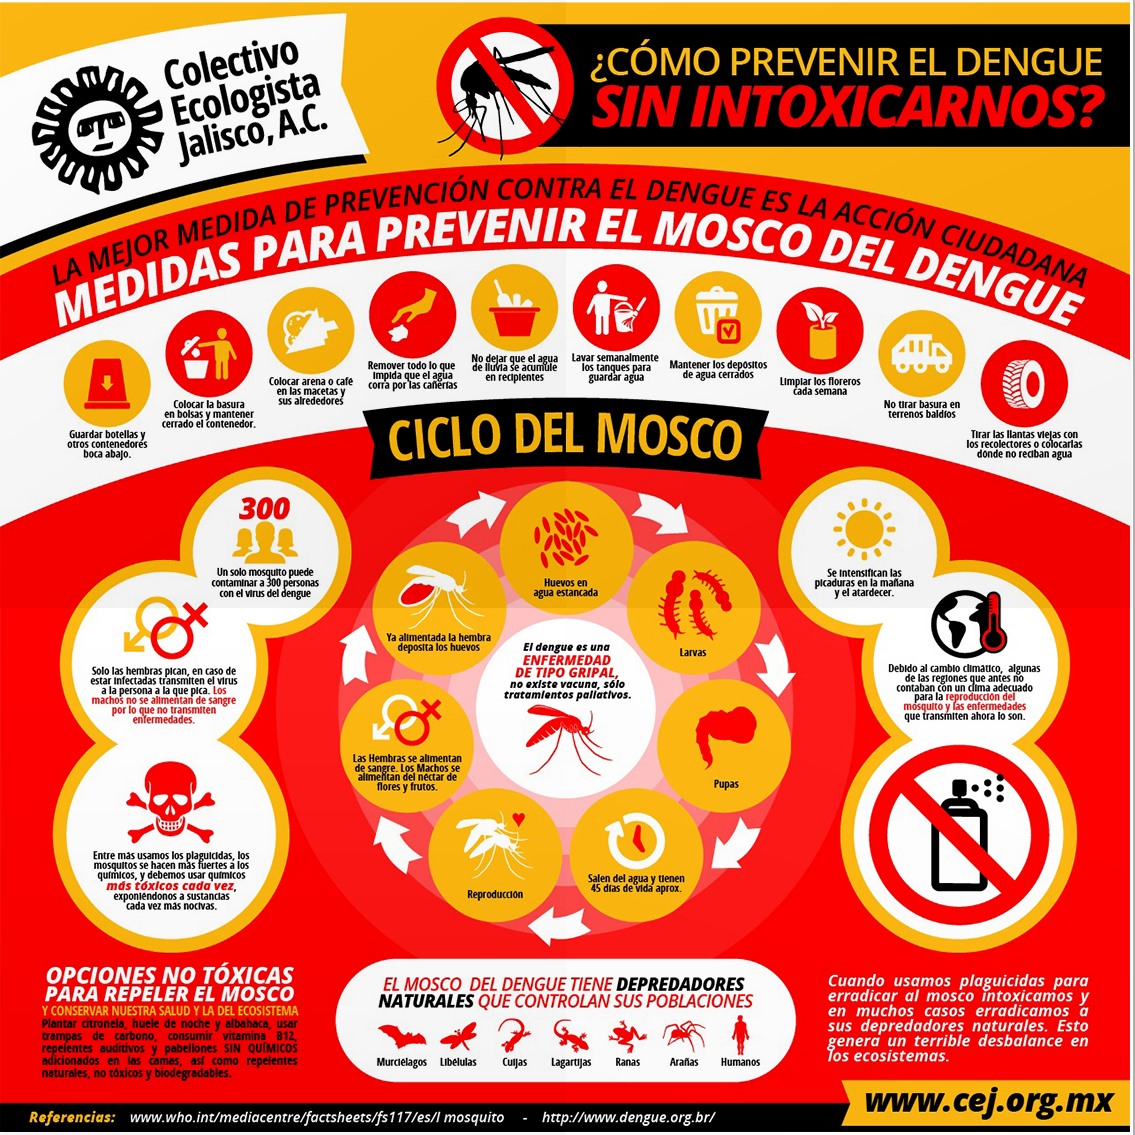 Dengue_mockup 2.jpg